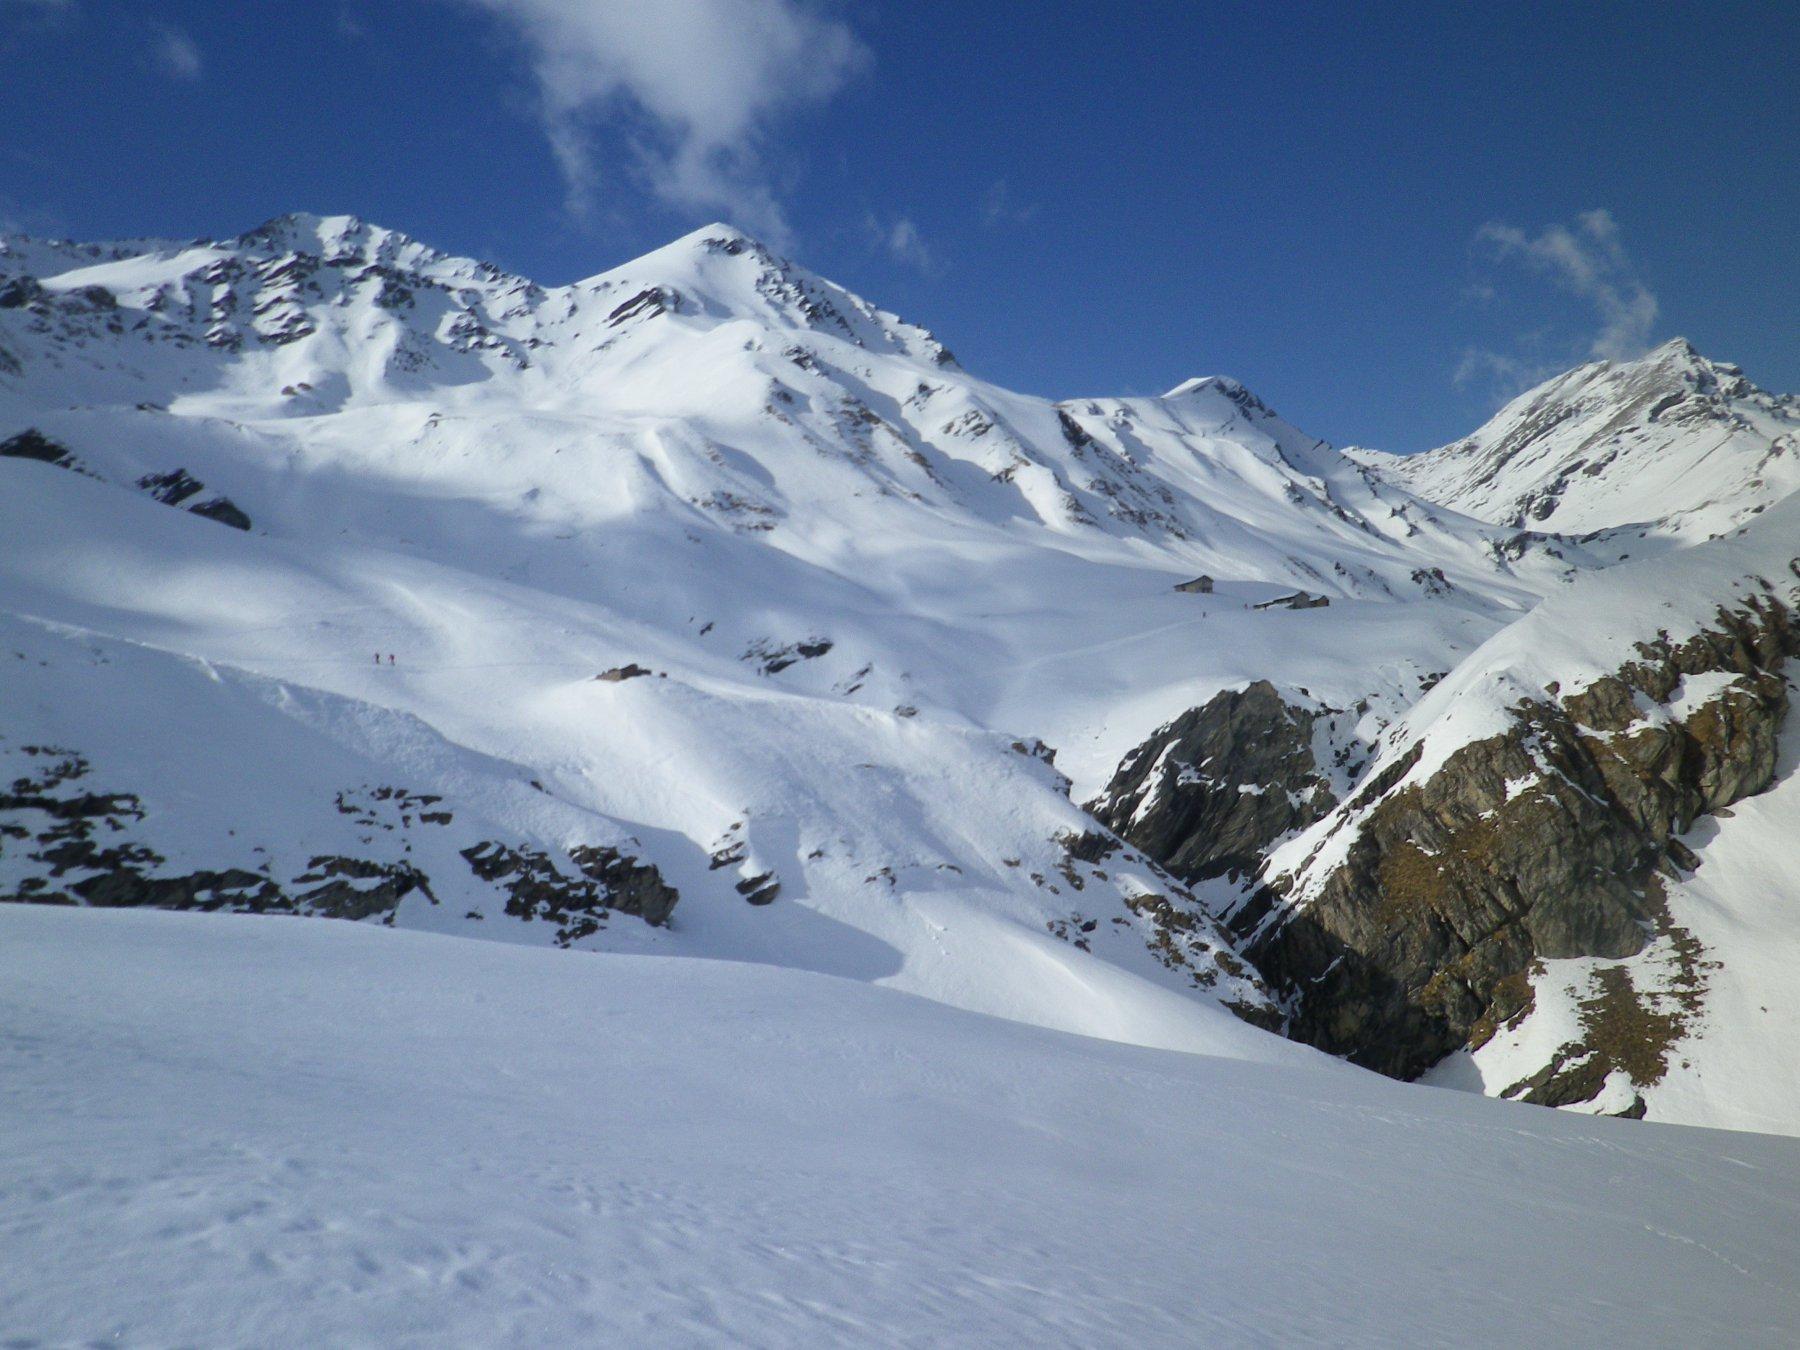 le belle montagne della val Varaita